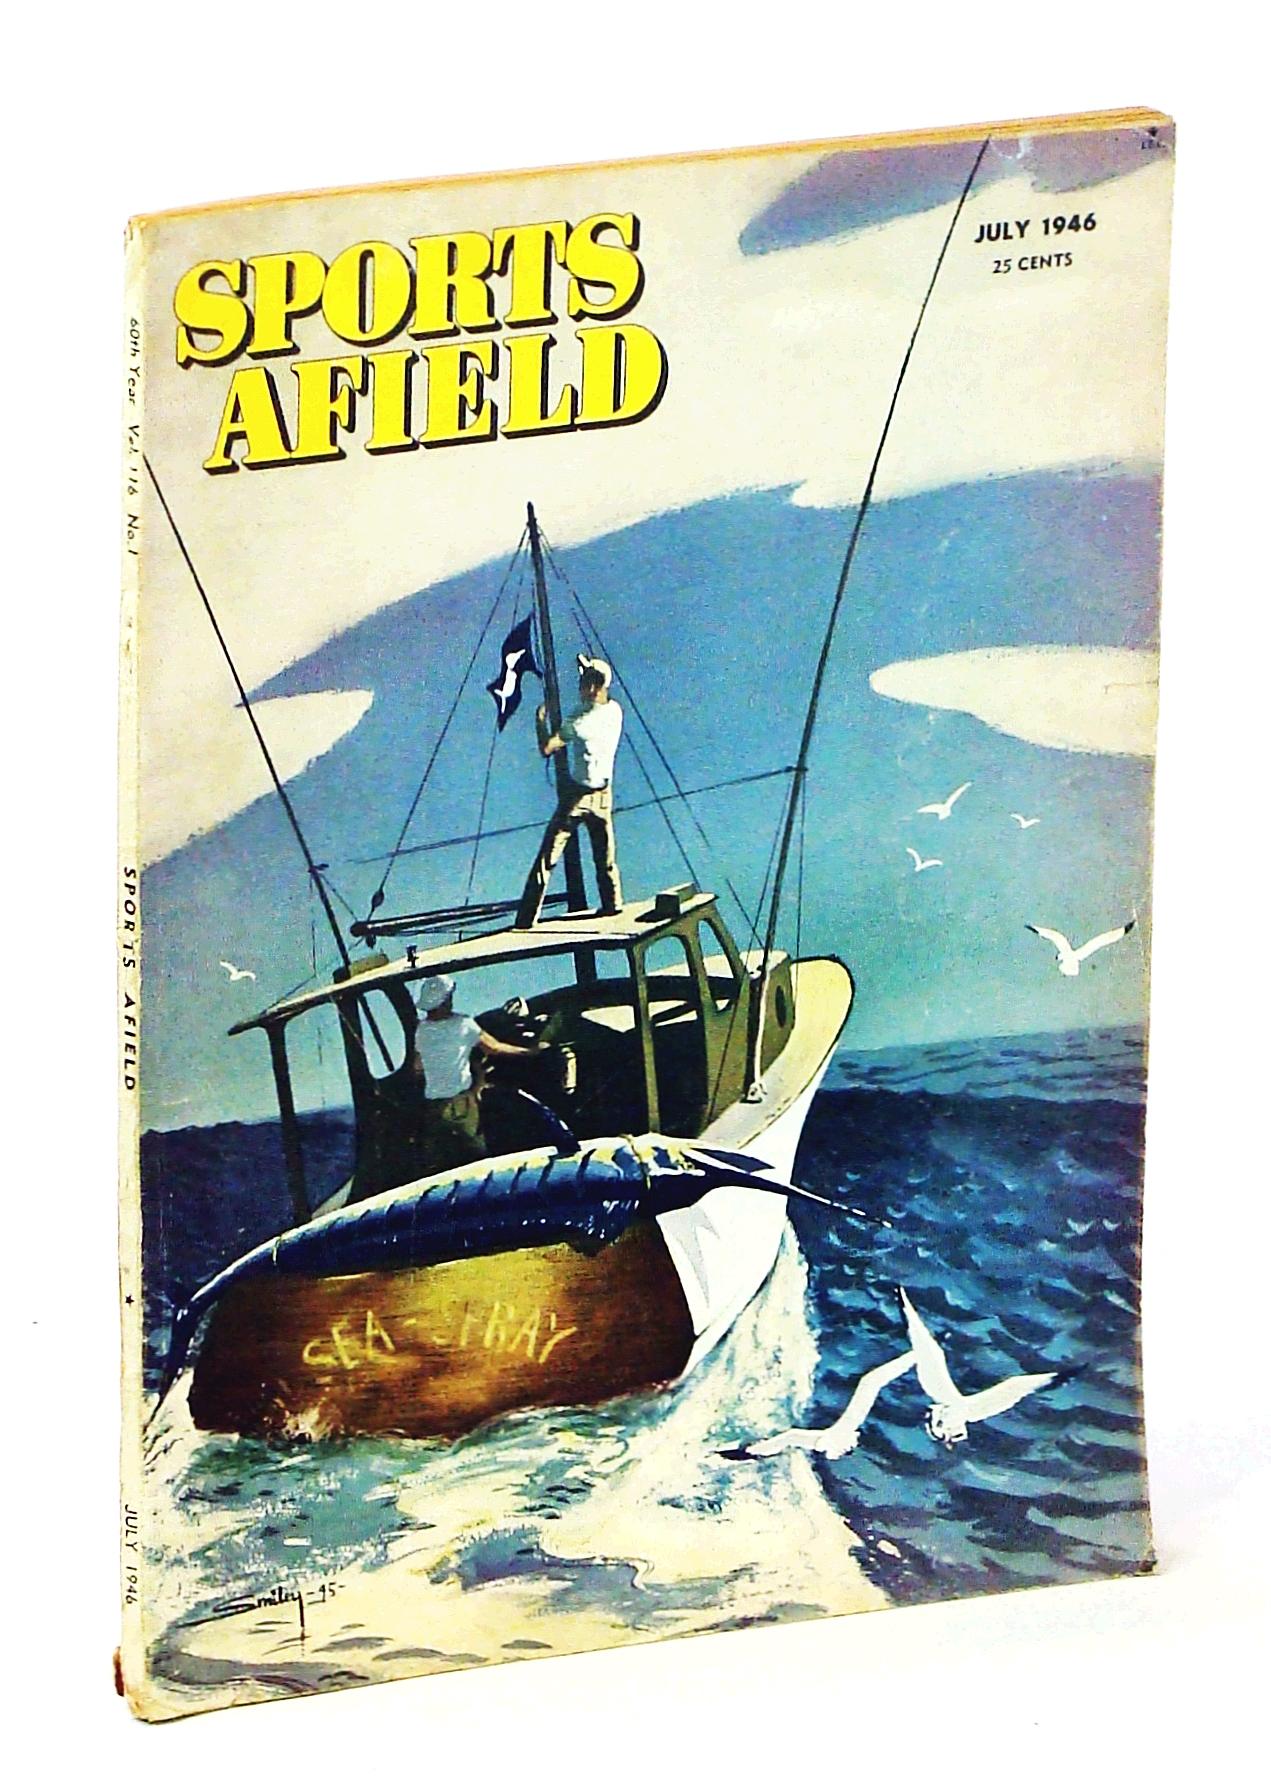 Sports Afield Magazine, July 1946, Vol. 116,: Dunathan, Clint; Babcock,